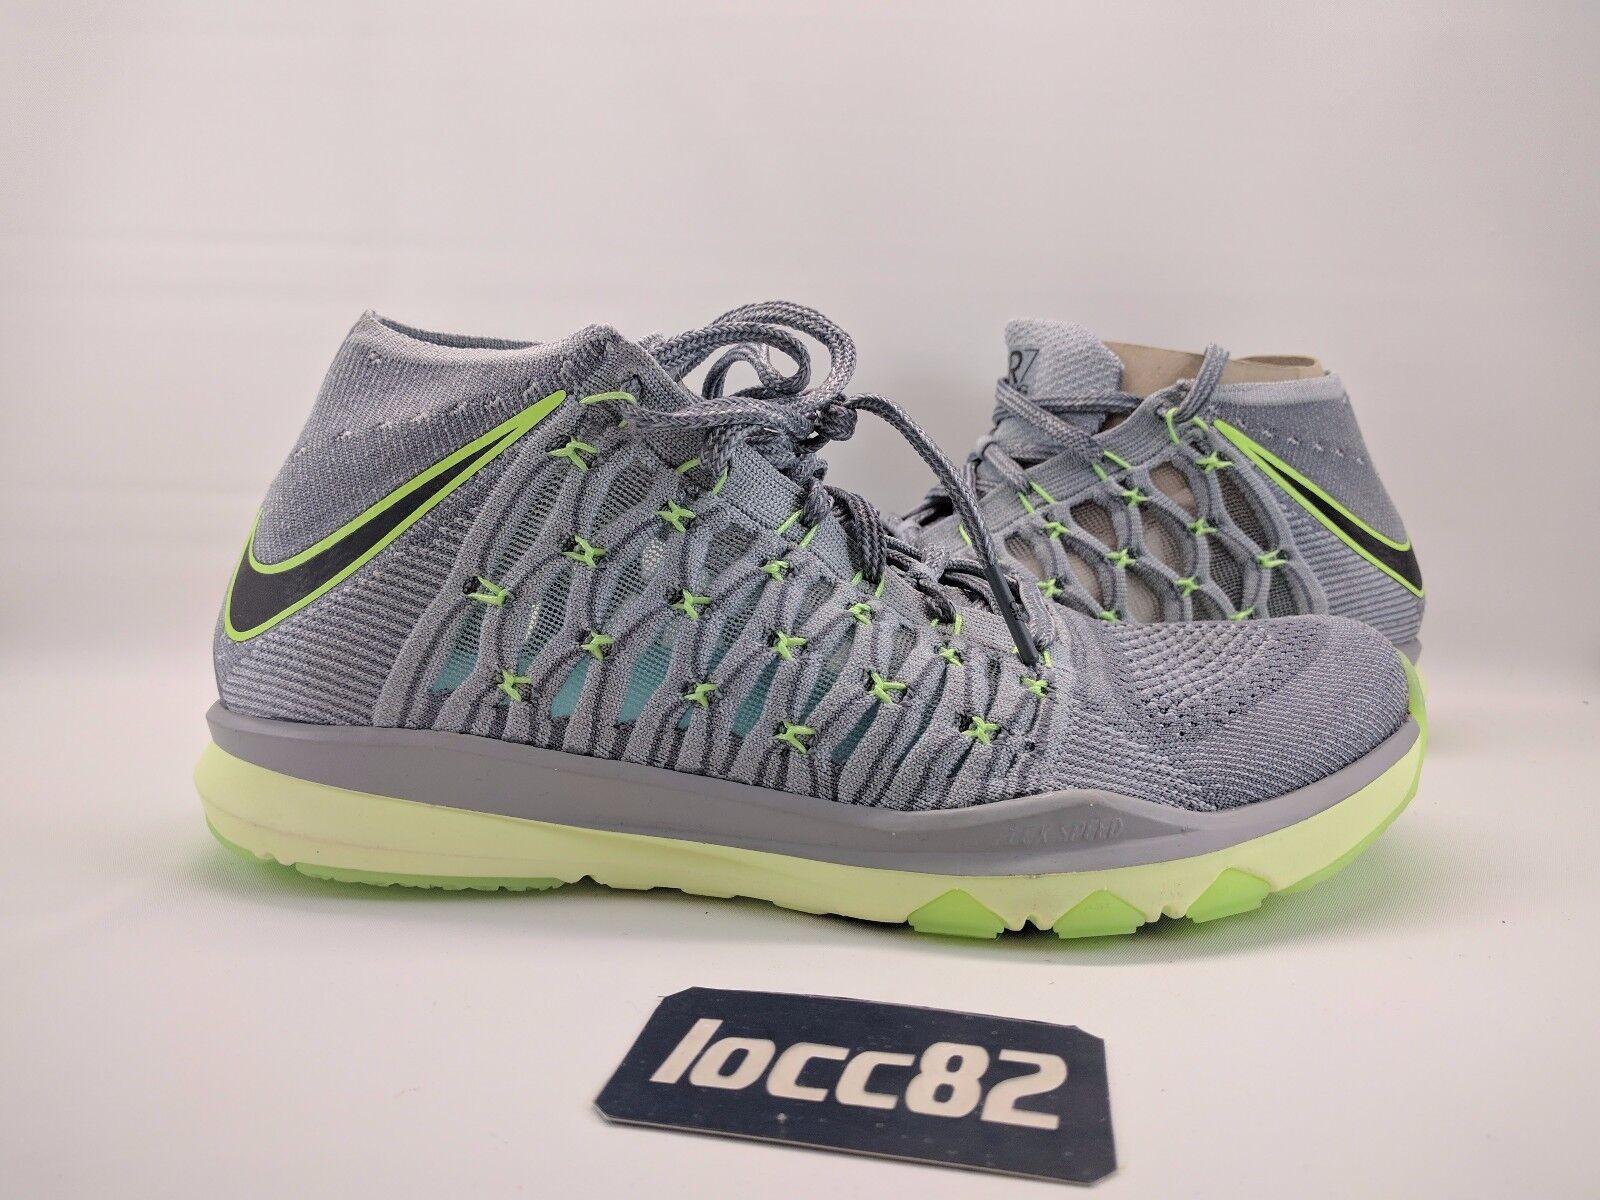 New Nike Train Ultrafast Flyknit CR7 Price reduction